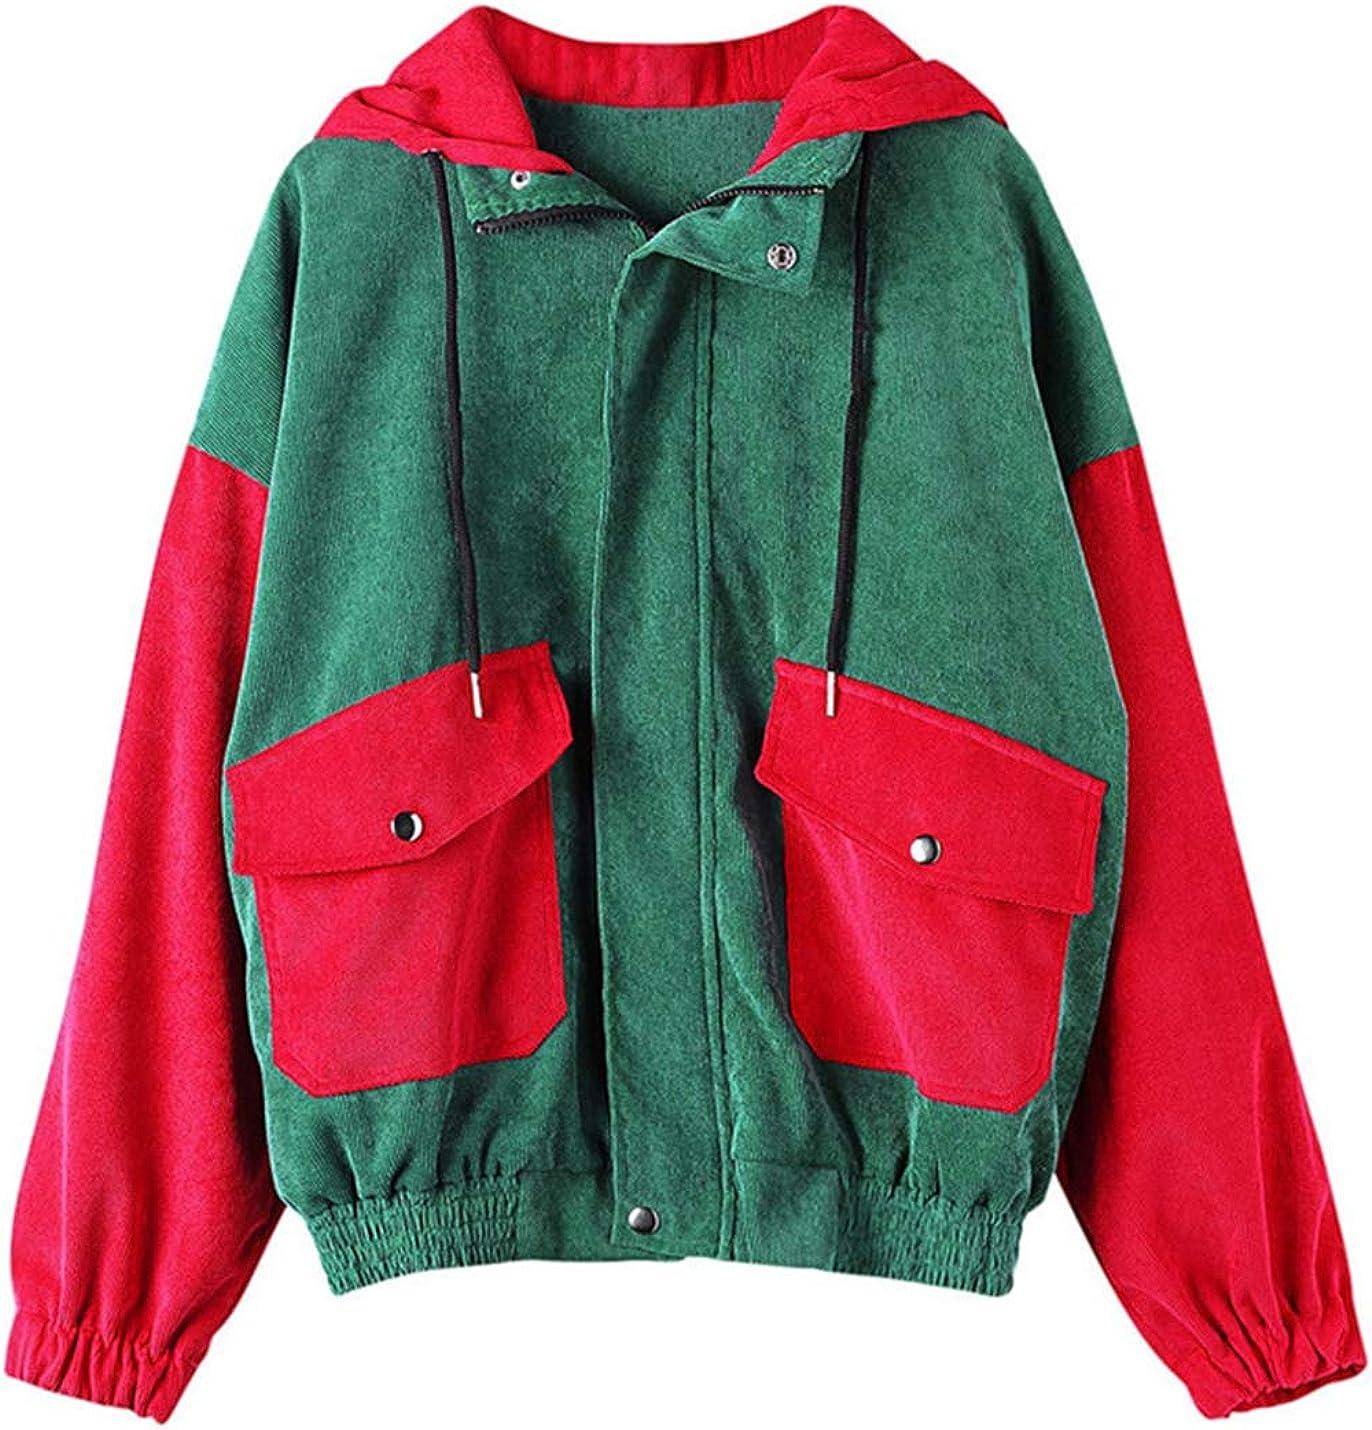 Yeokou Women's Loose Colorblock Drawstring Hoodie Corduroy Baseball Jacket Coats